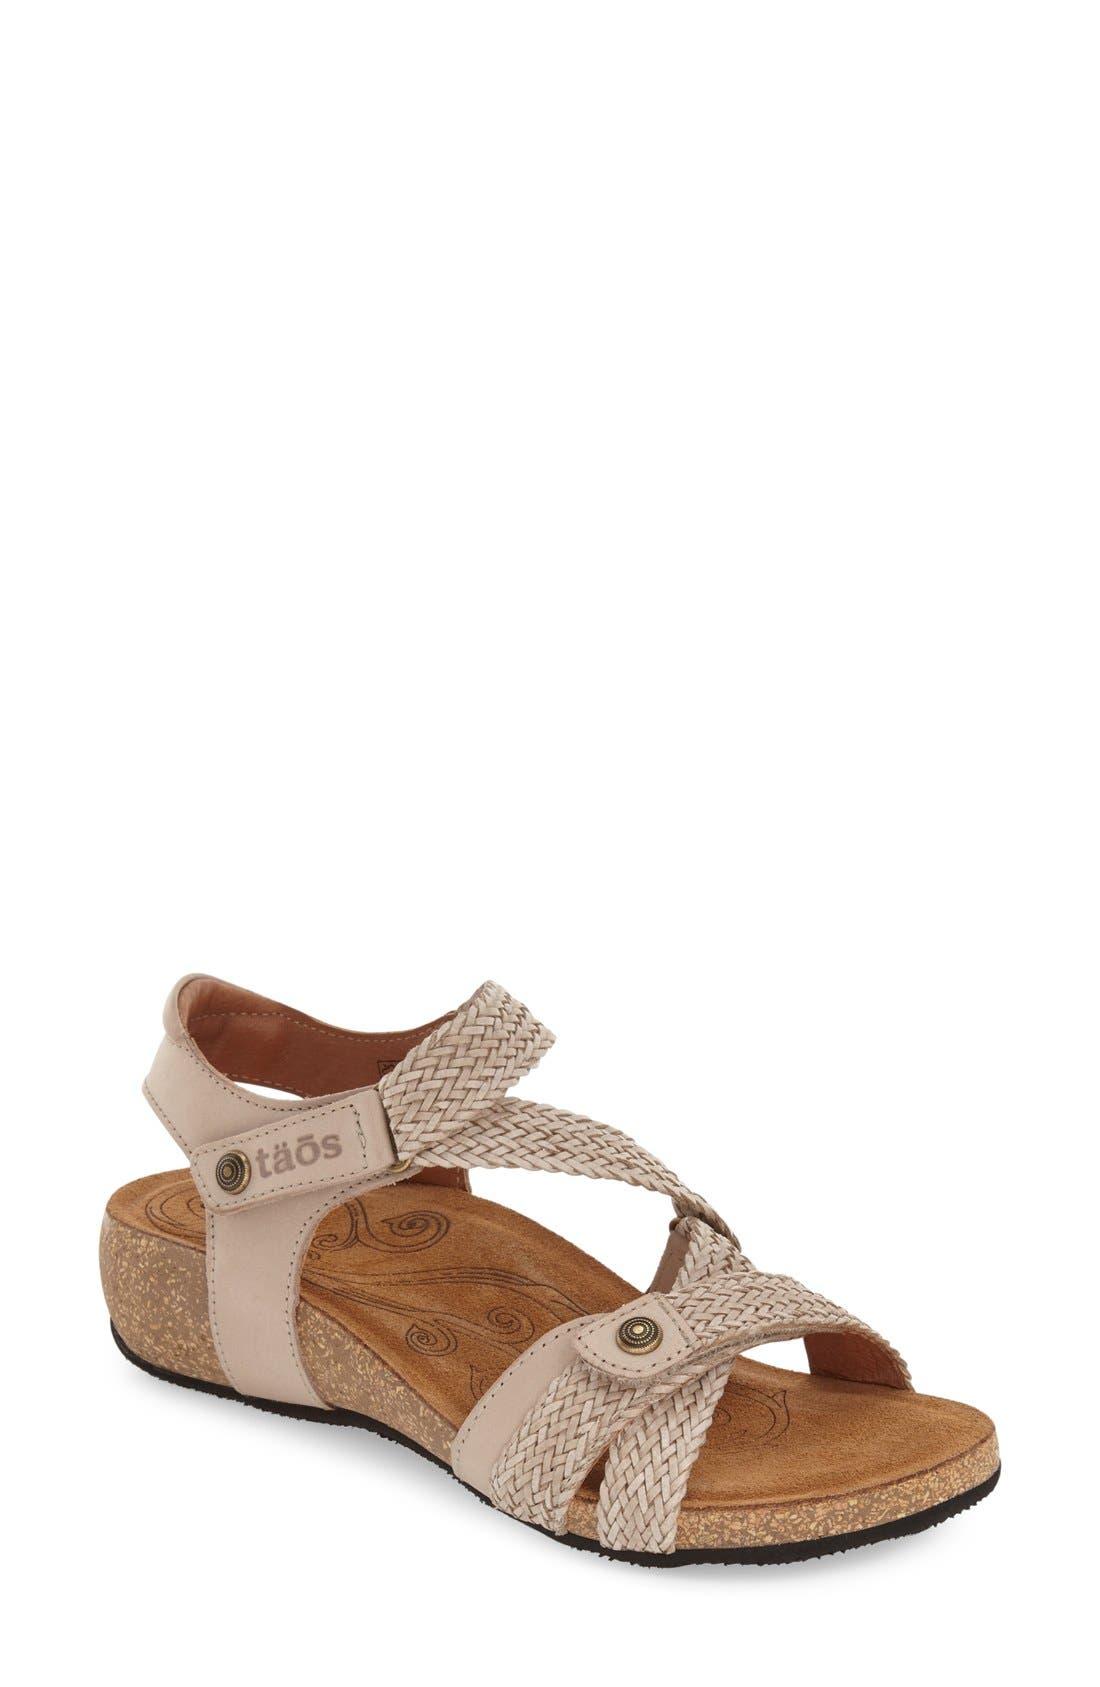 Taos 'Trulie' Wedge Sandal (Women)